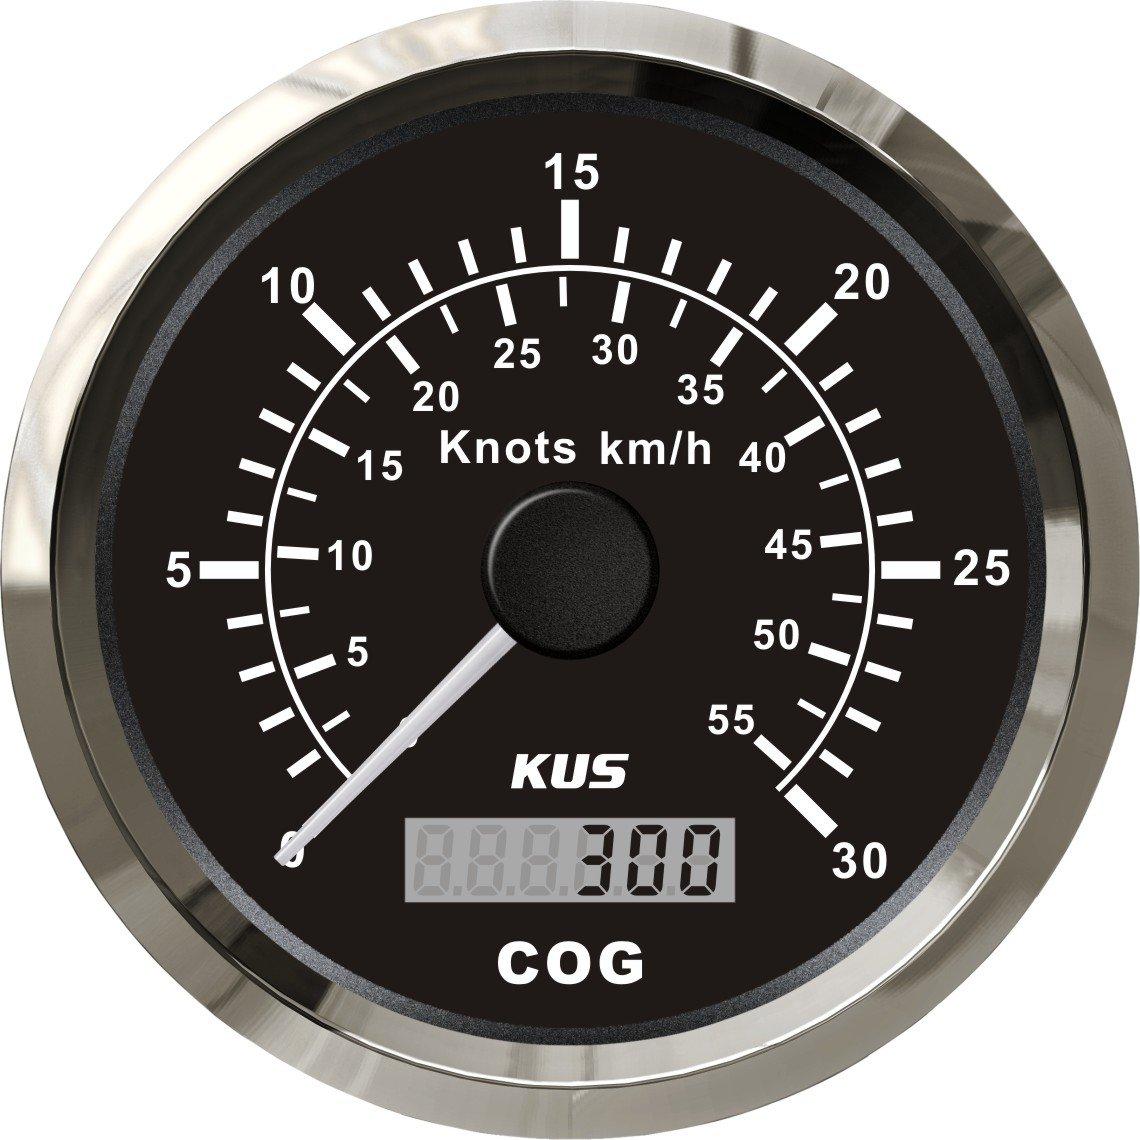 Kus GPS velocí metro 0 –  30 nudos con retroiluminació n 85 mm 12 V/24 V SPR